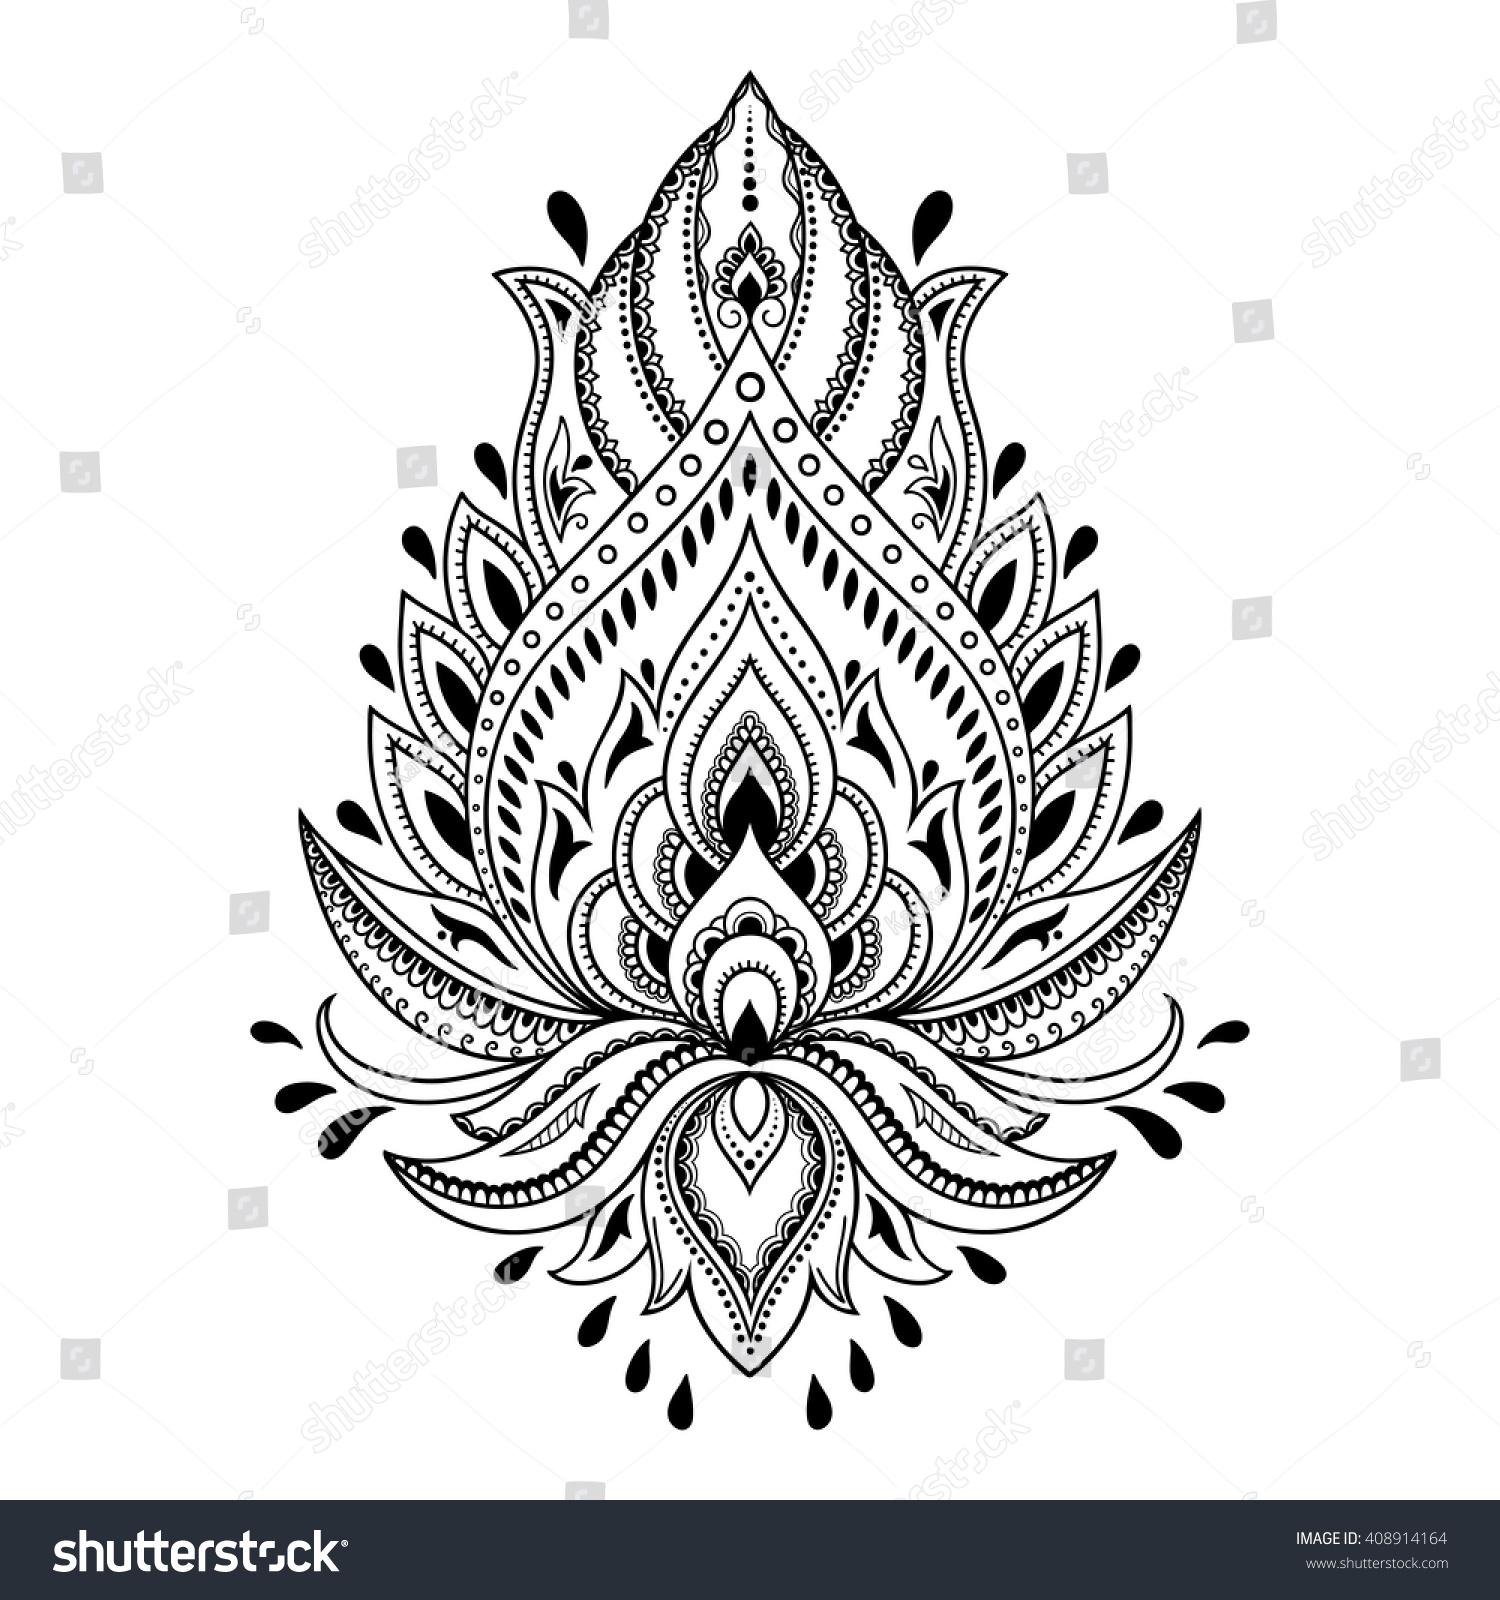 Indian Henna Tattoo Designs: Henna Tattoo Flower Template Indian Style Stock Vector